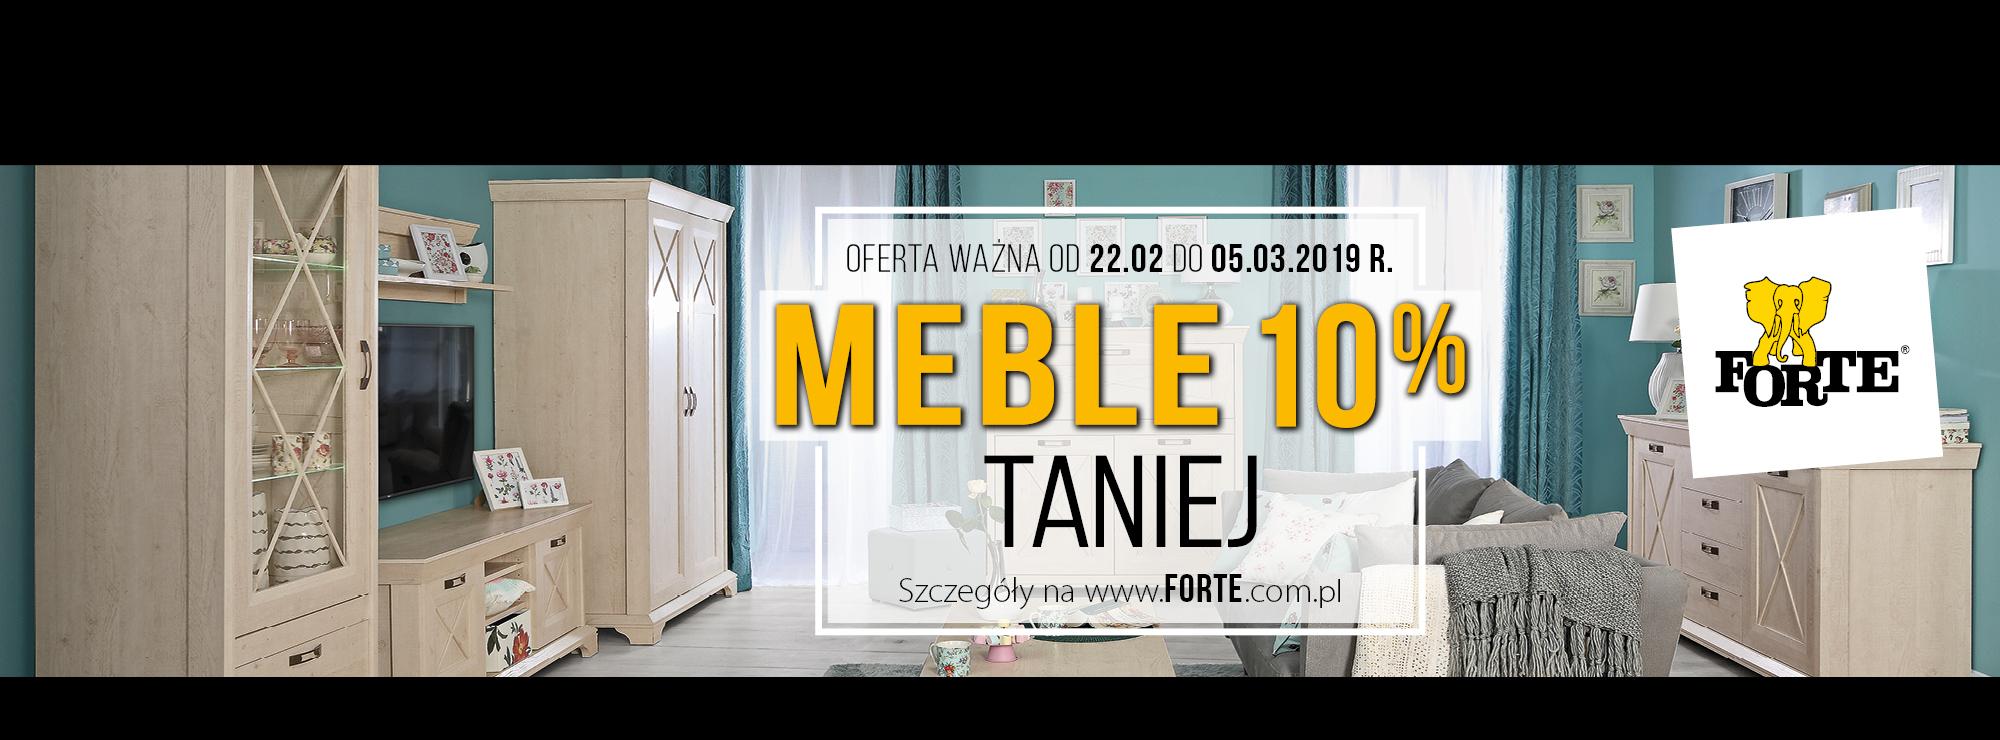 Toruń_Slider_2000x740